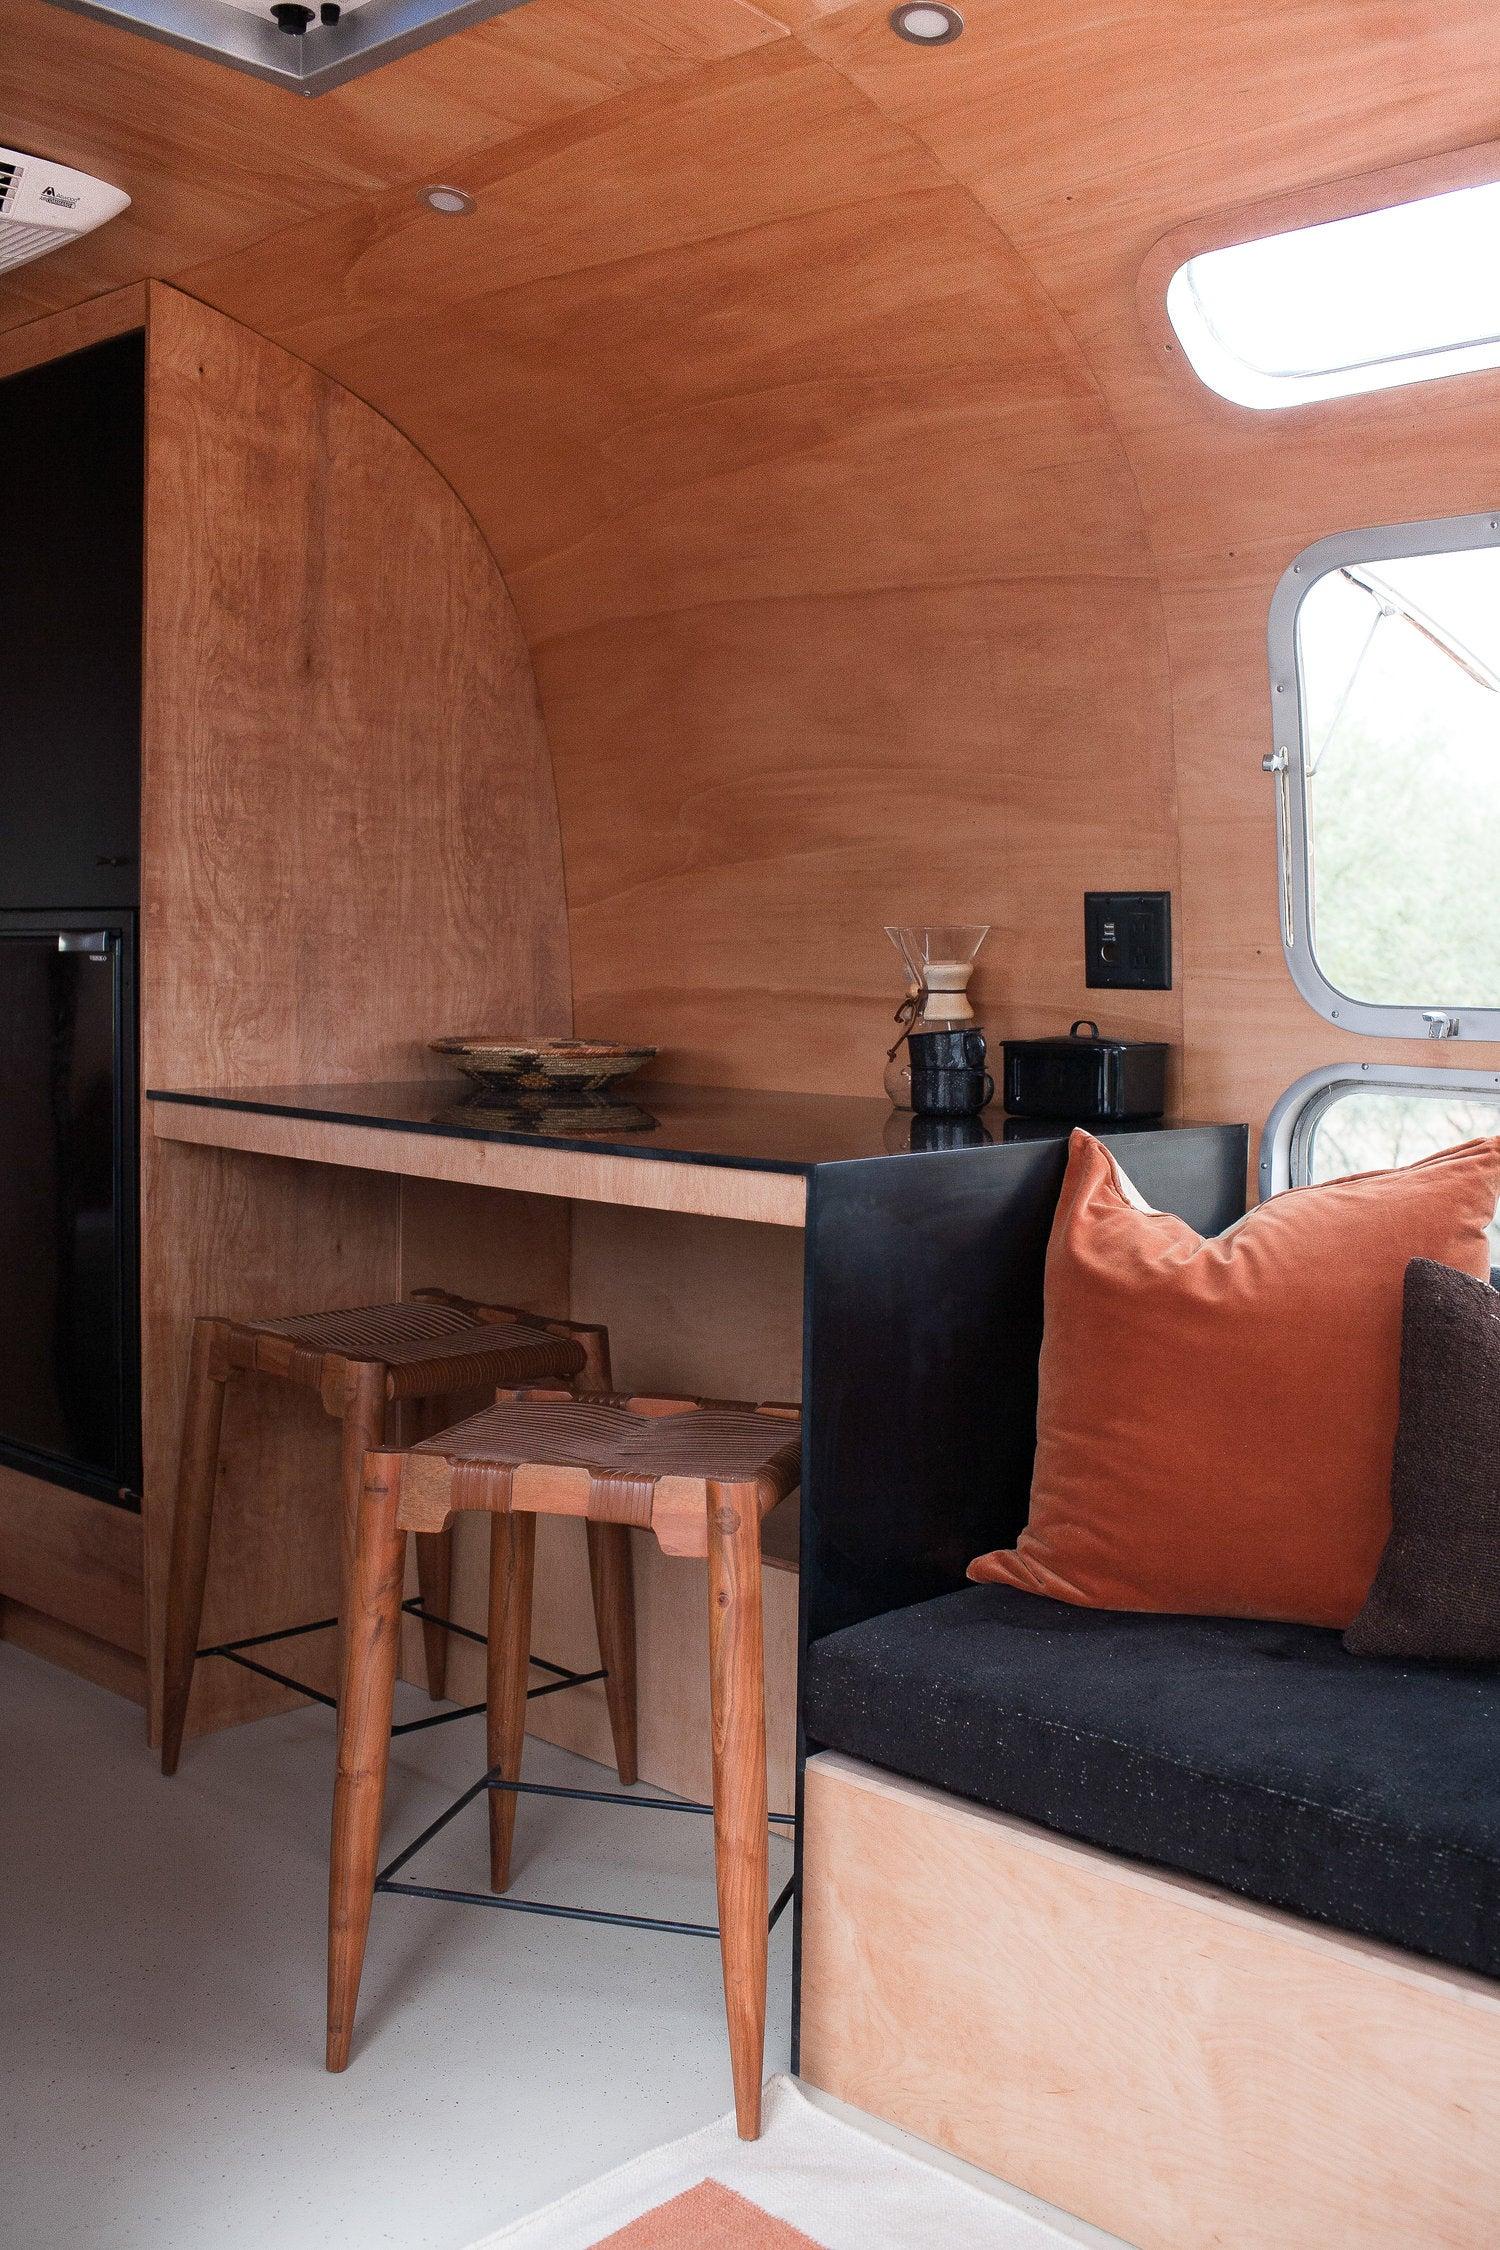 This Airstream Motorhome Packs Major Mid-Century Style into 200